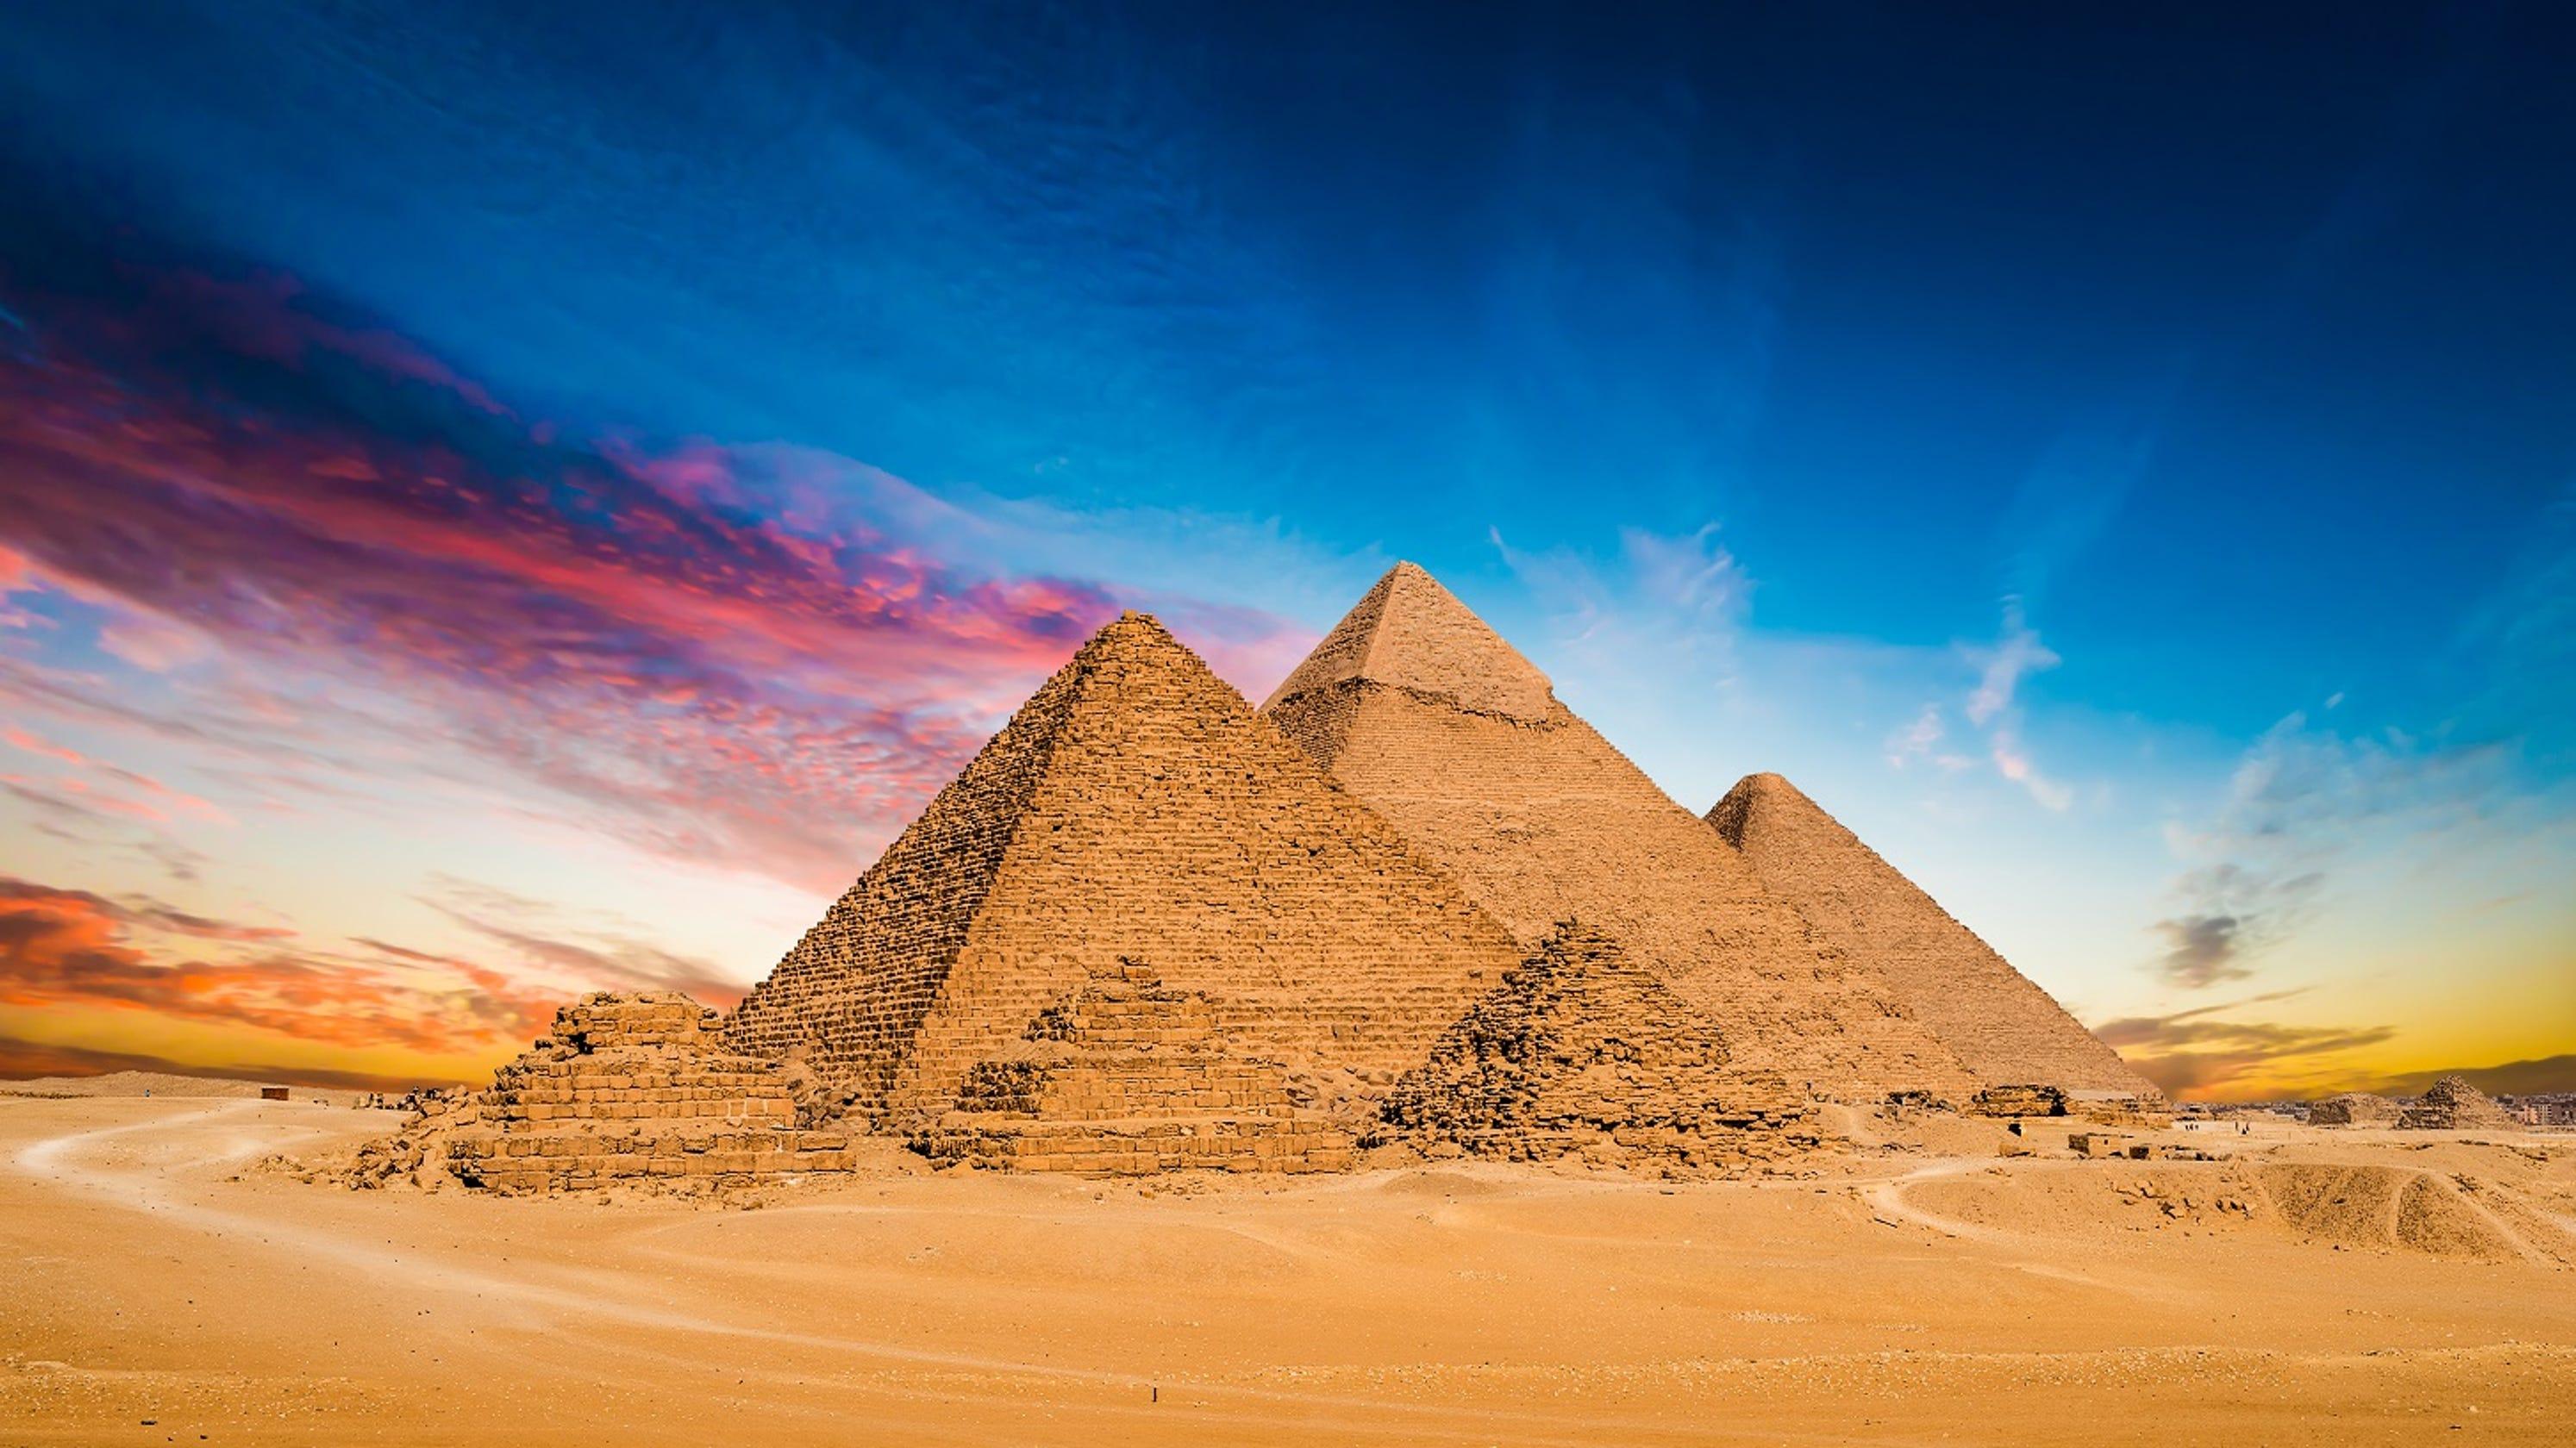 Pyramids-min